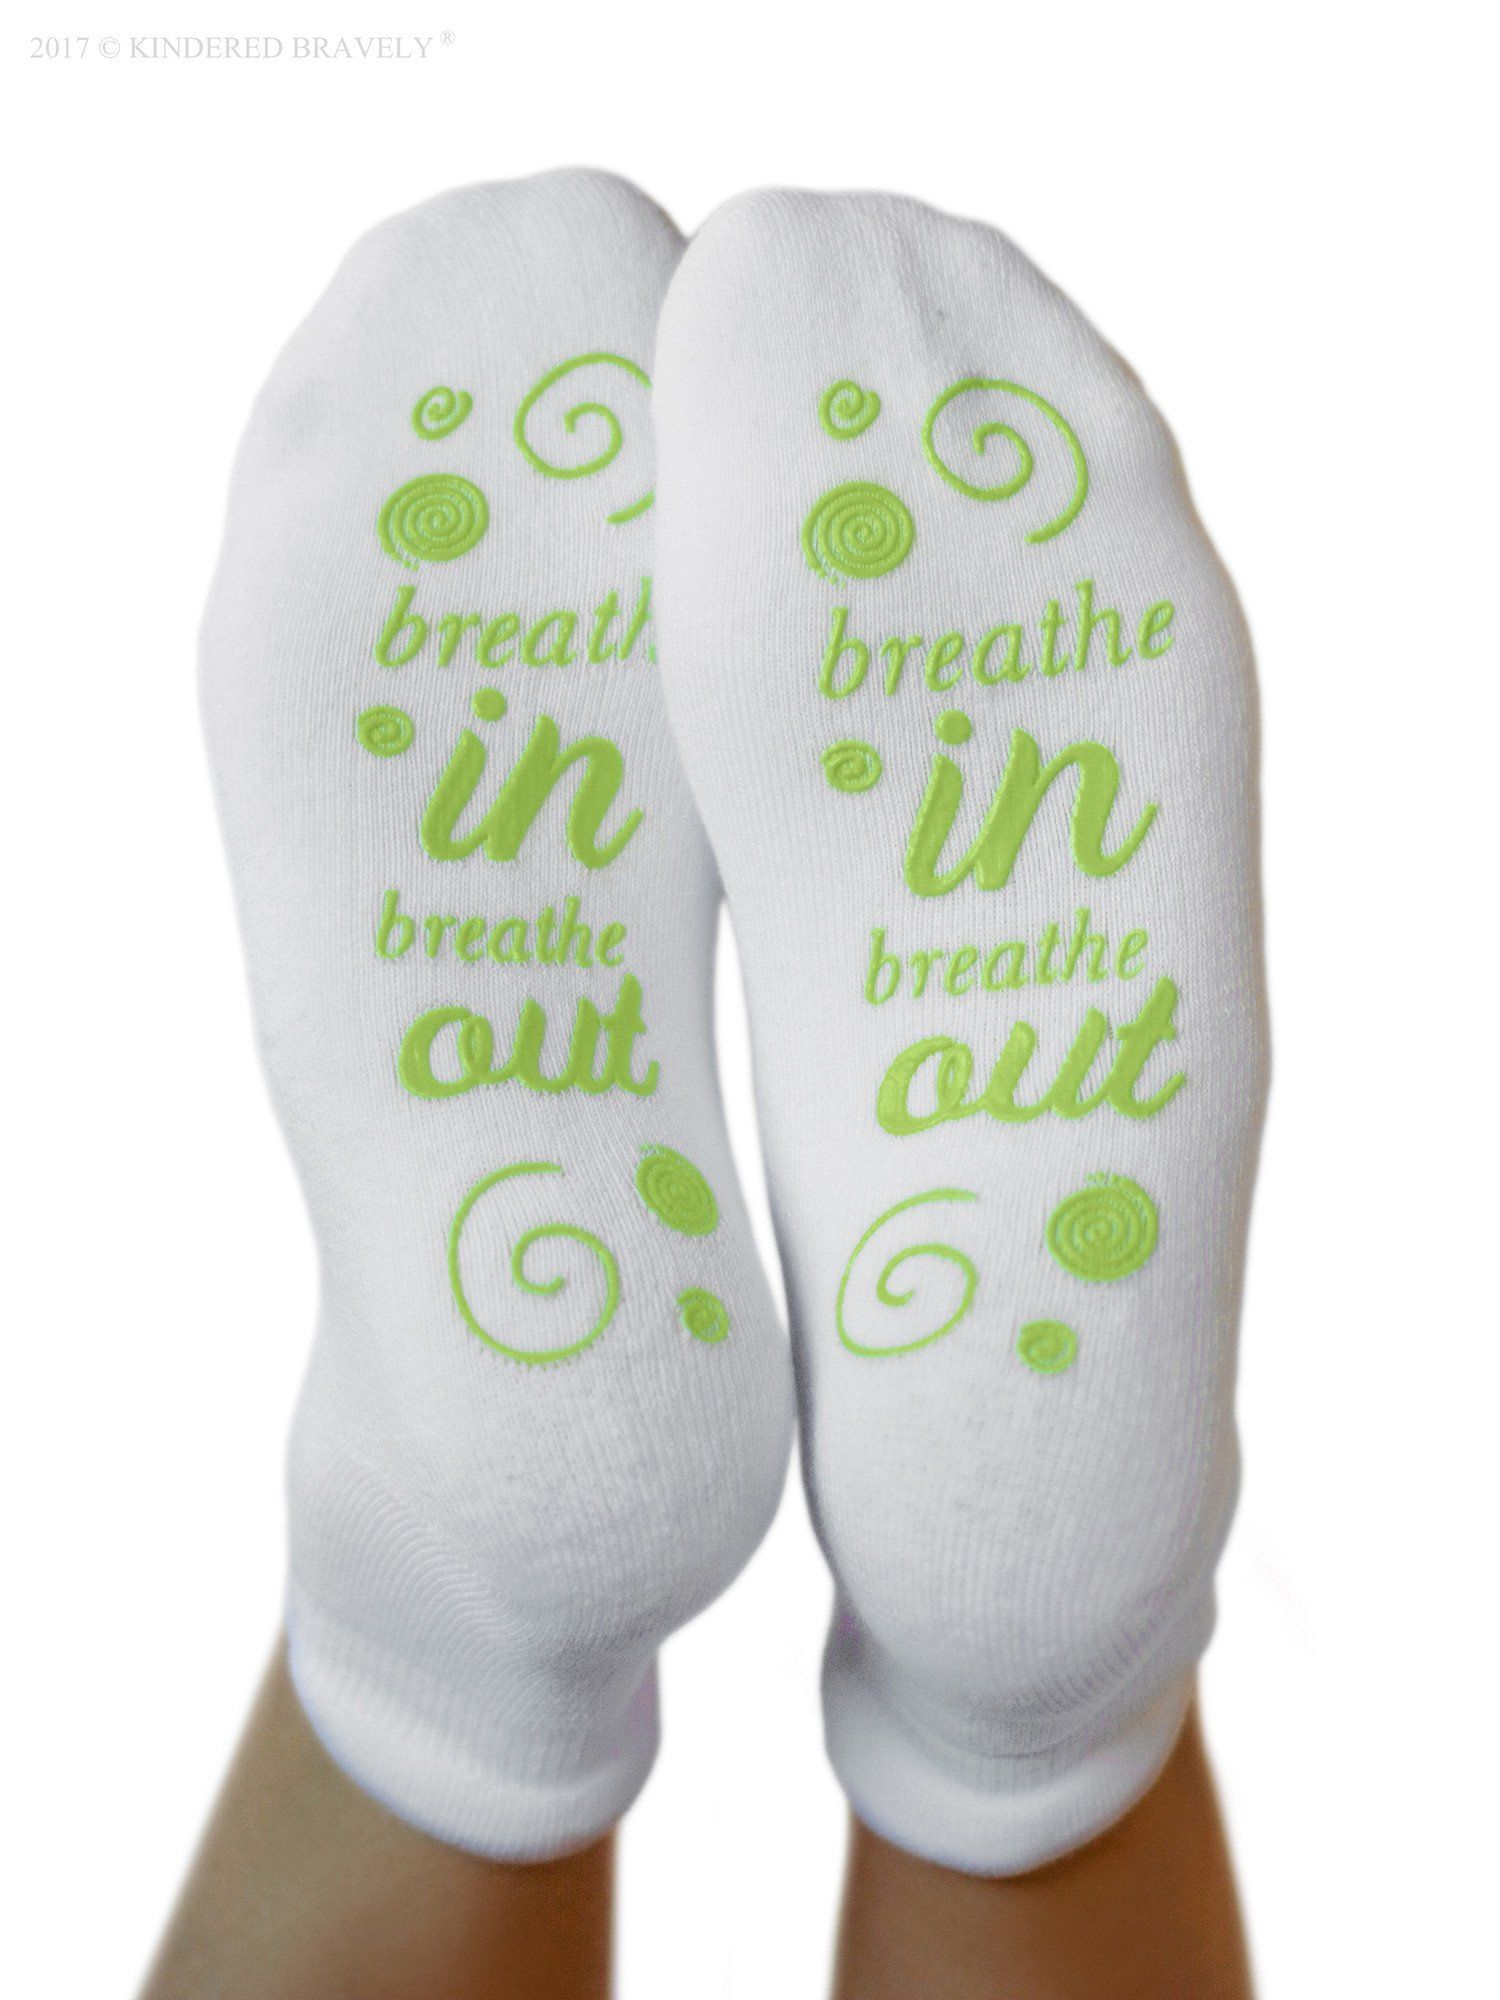 Labor Delivery Inspiration Hospital Non Skid Push Socks for Maternity Pregnancy